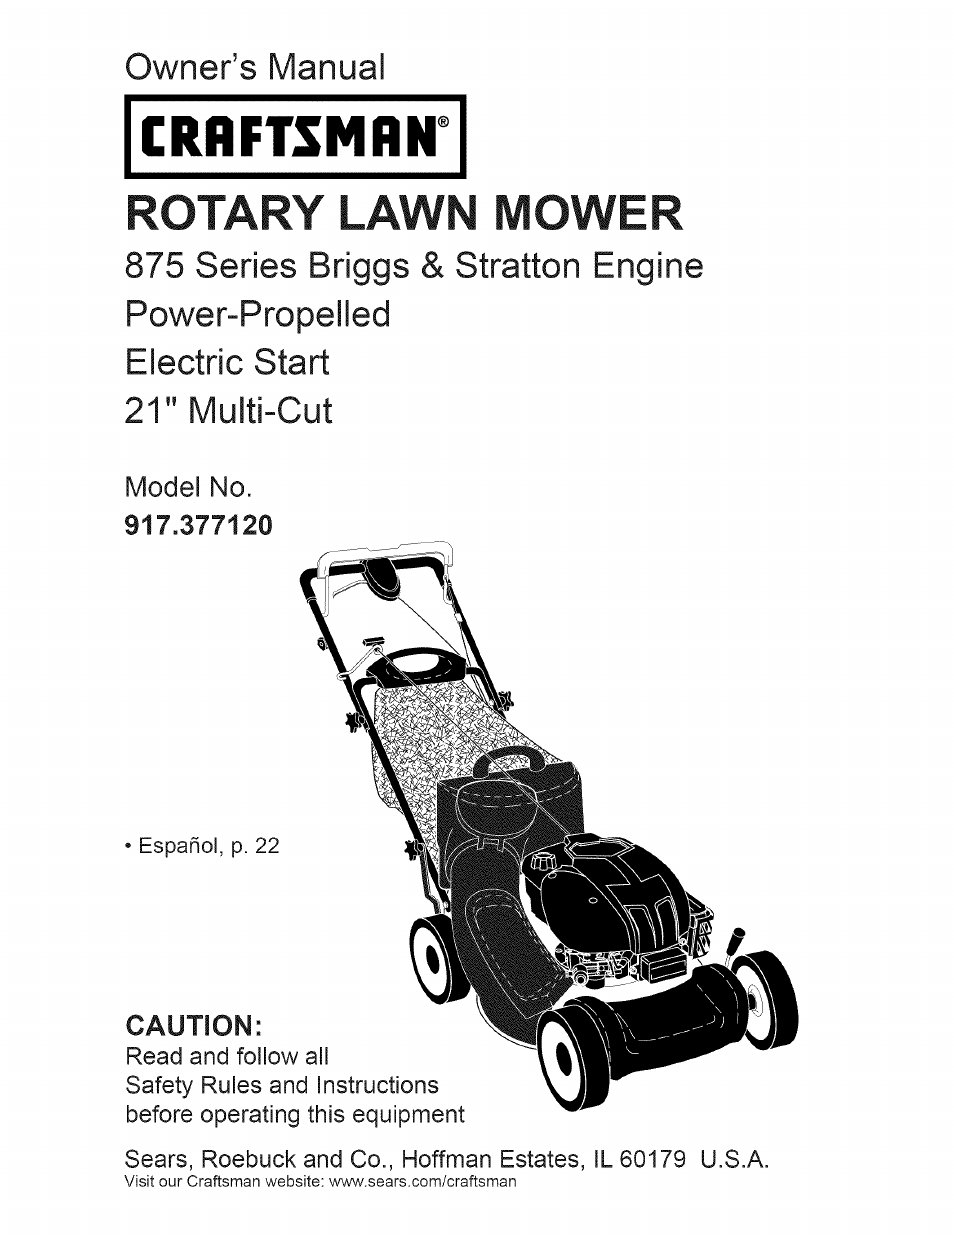 craftsman 917 377120 user manual 56 pages rh manualsdir com Craftsman Lawn Mower Belts Diagram Craftsman 6.0 Lawn Mower Parts